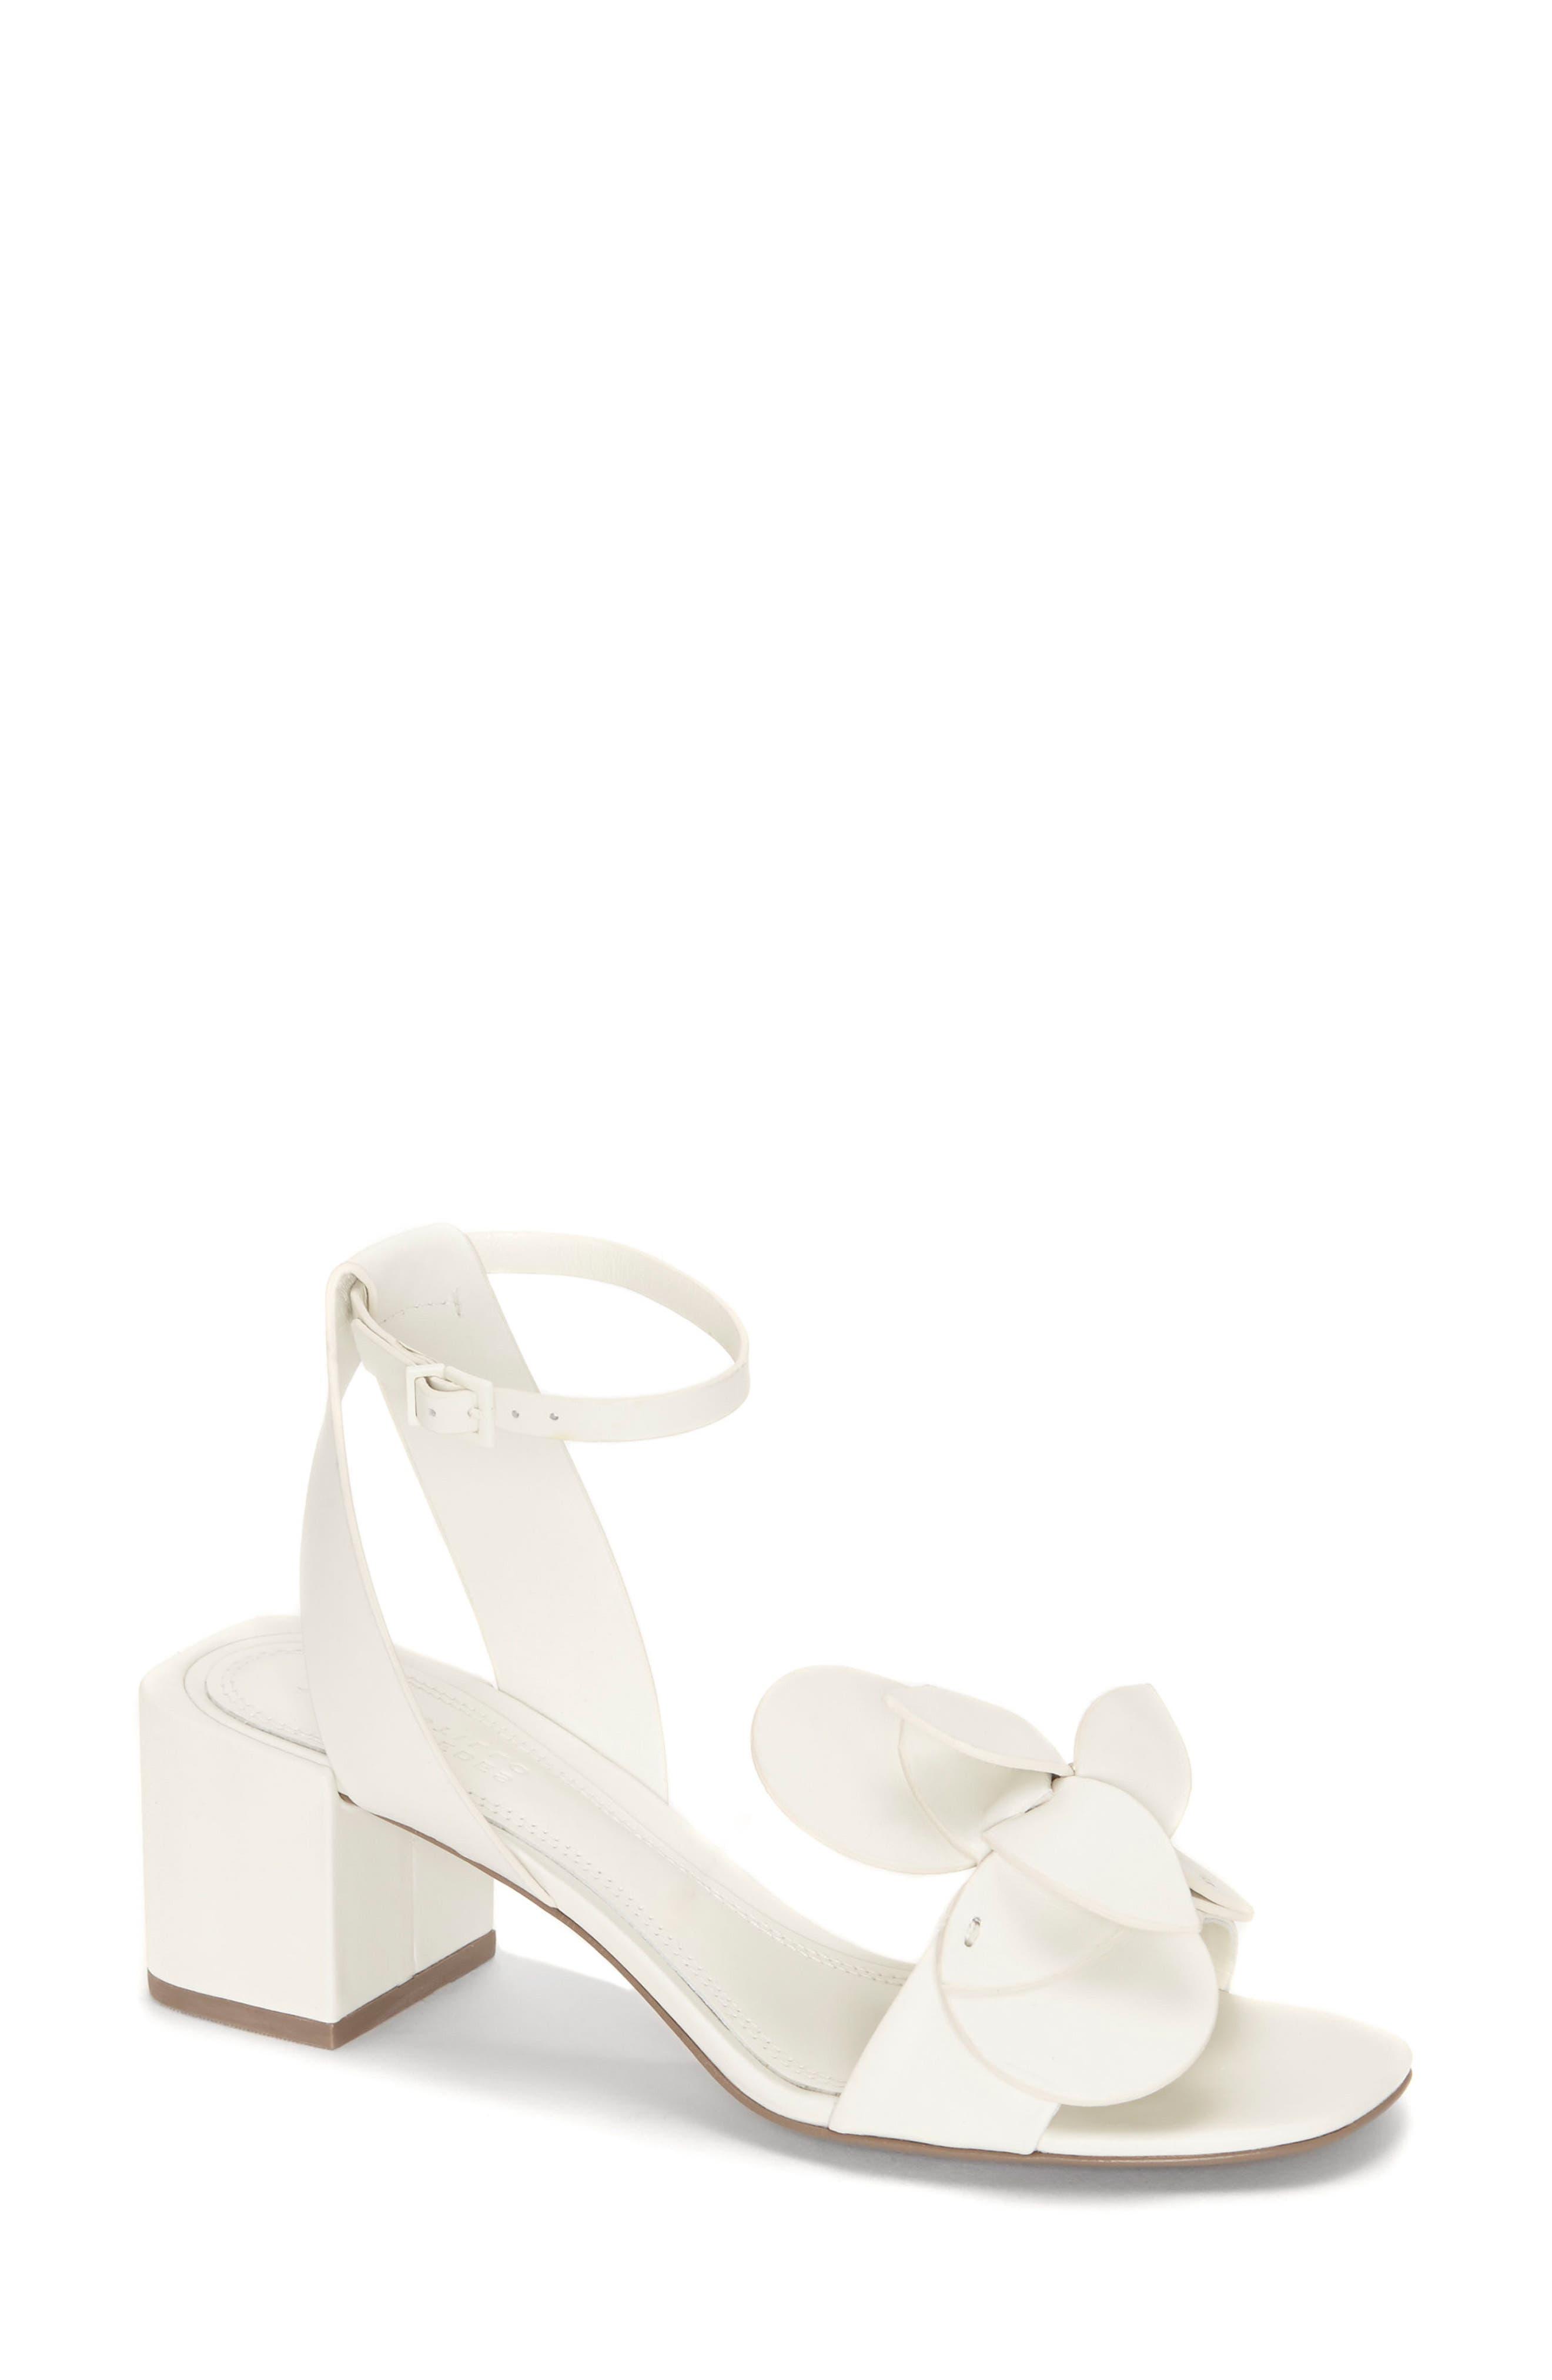 Tealia Sculpted Floral Sandal,                         Main,                         color, White Leather